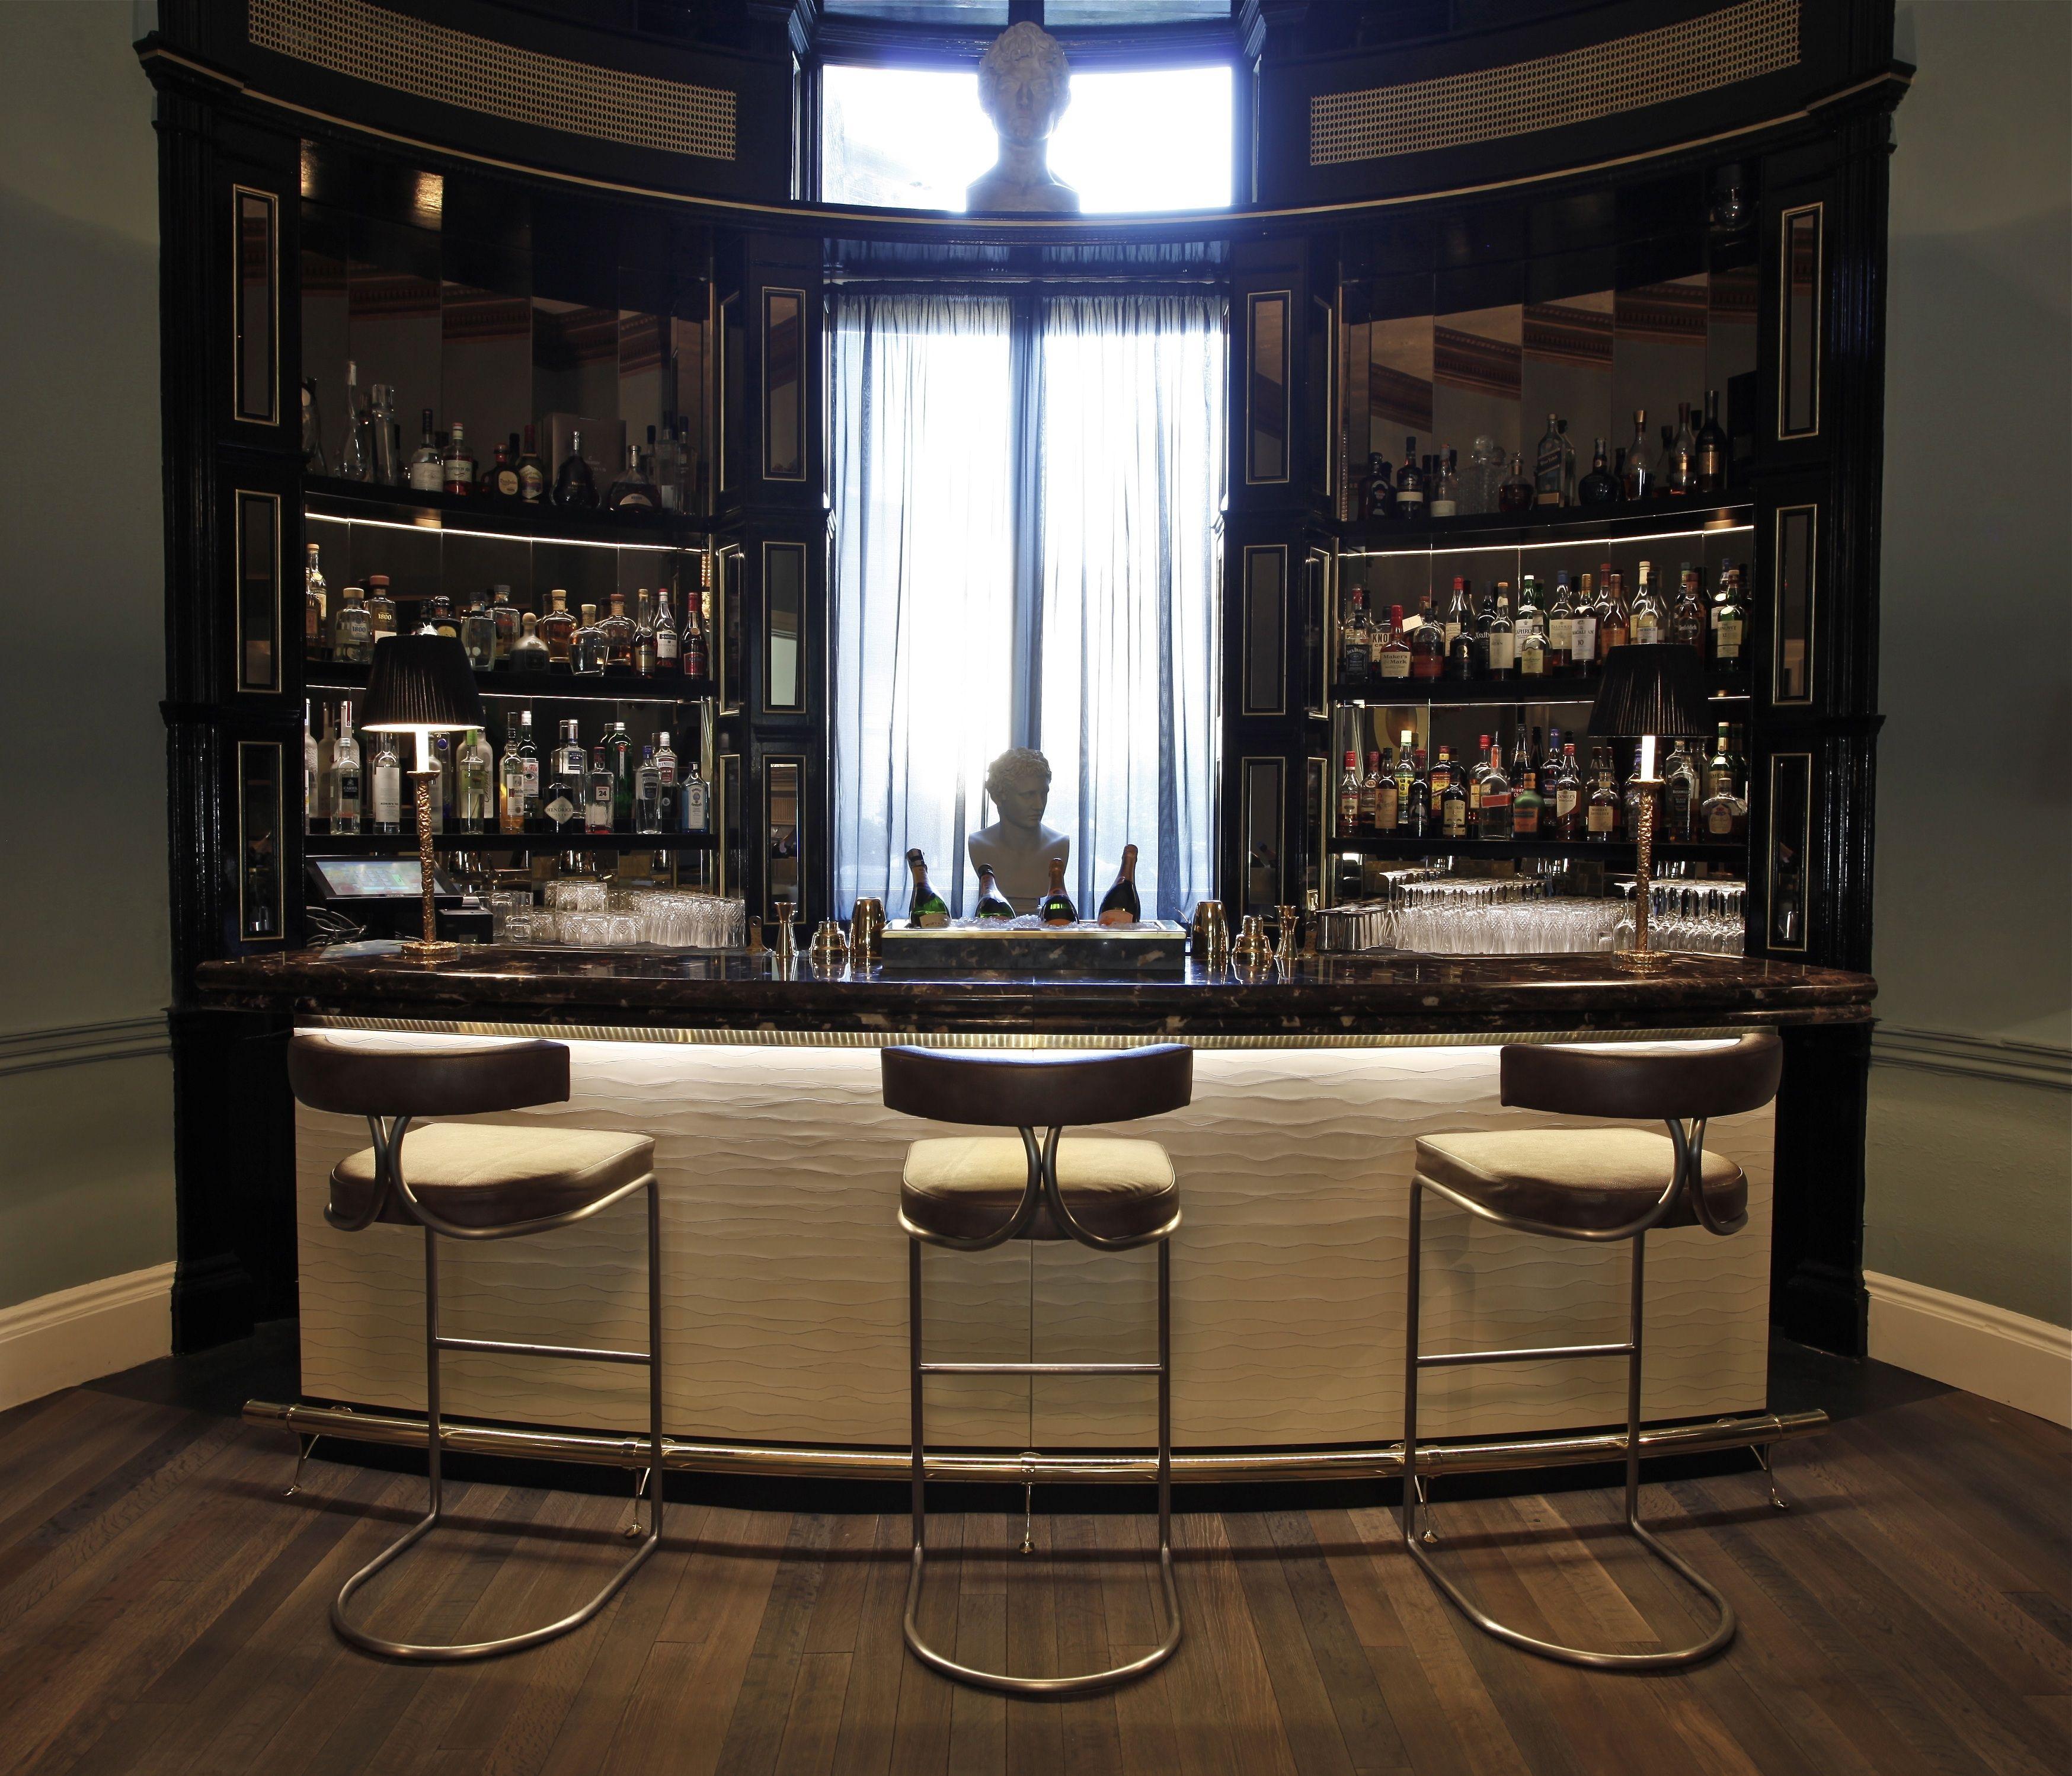 Home House Bar Bars For Home Home Bar Designs Home Cocktail Bar